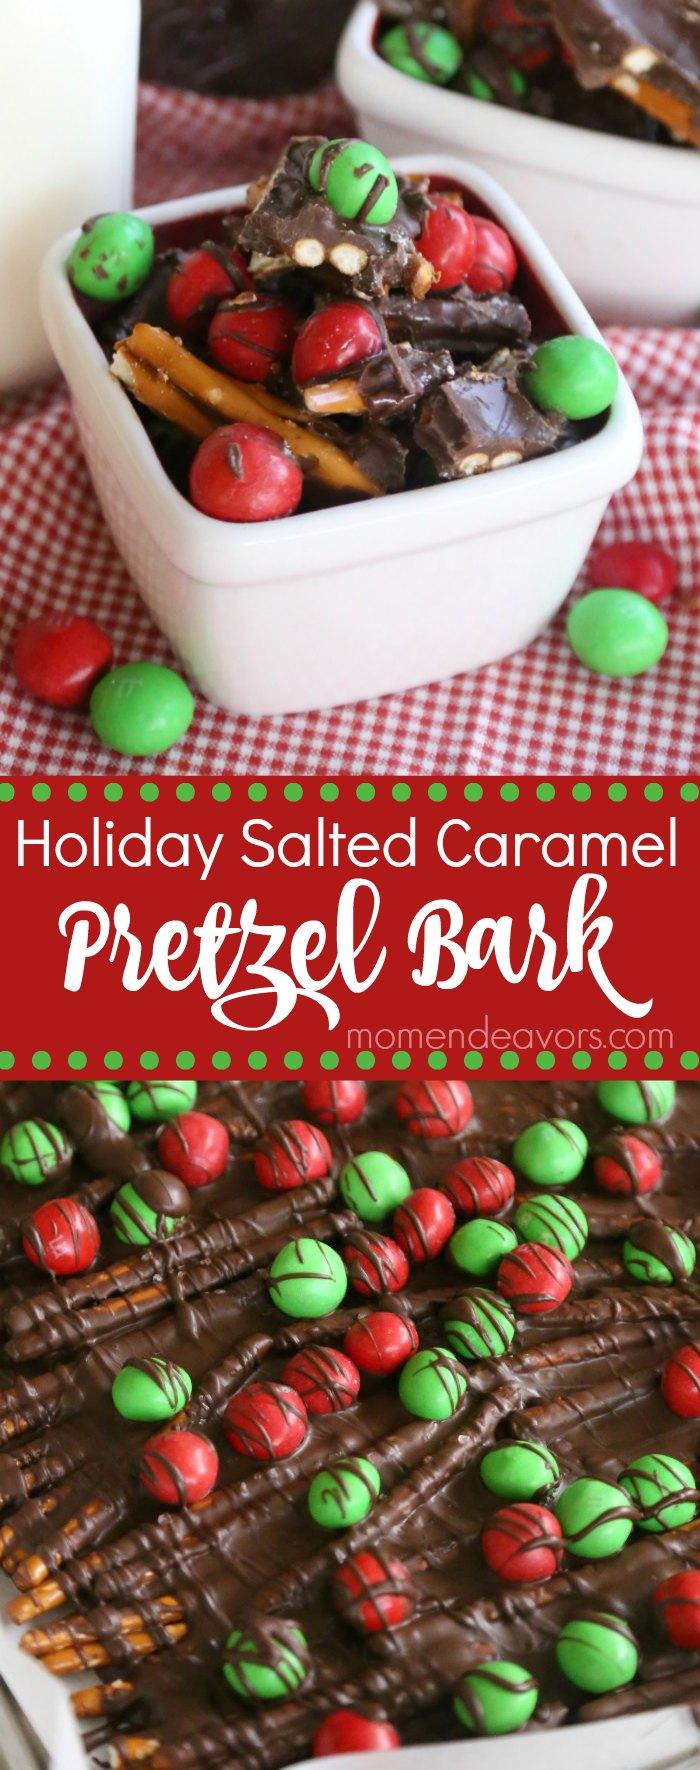 Holiday Salted Caramel Pretzel Bark Recipe